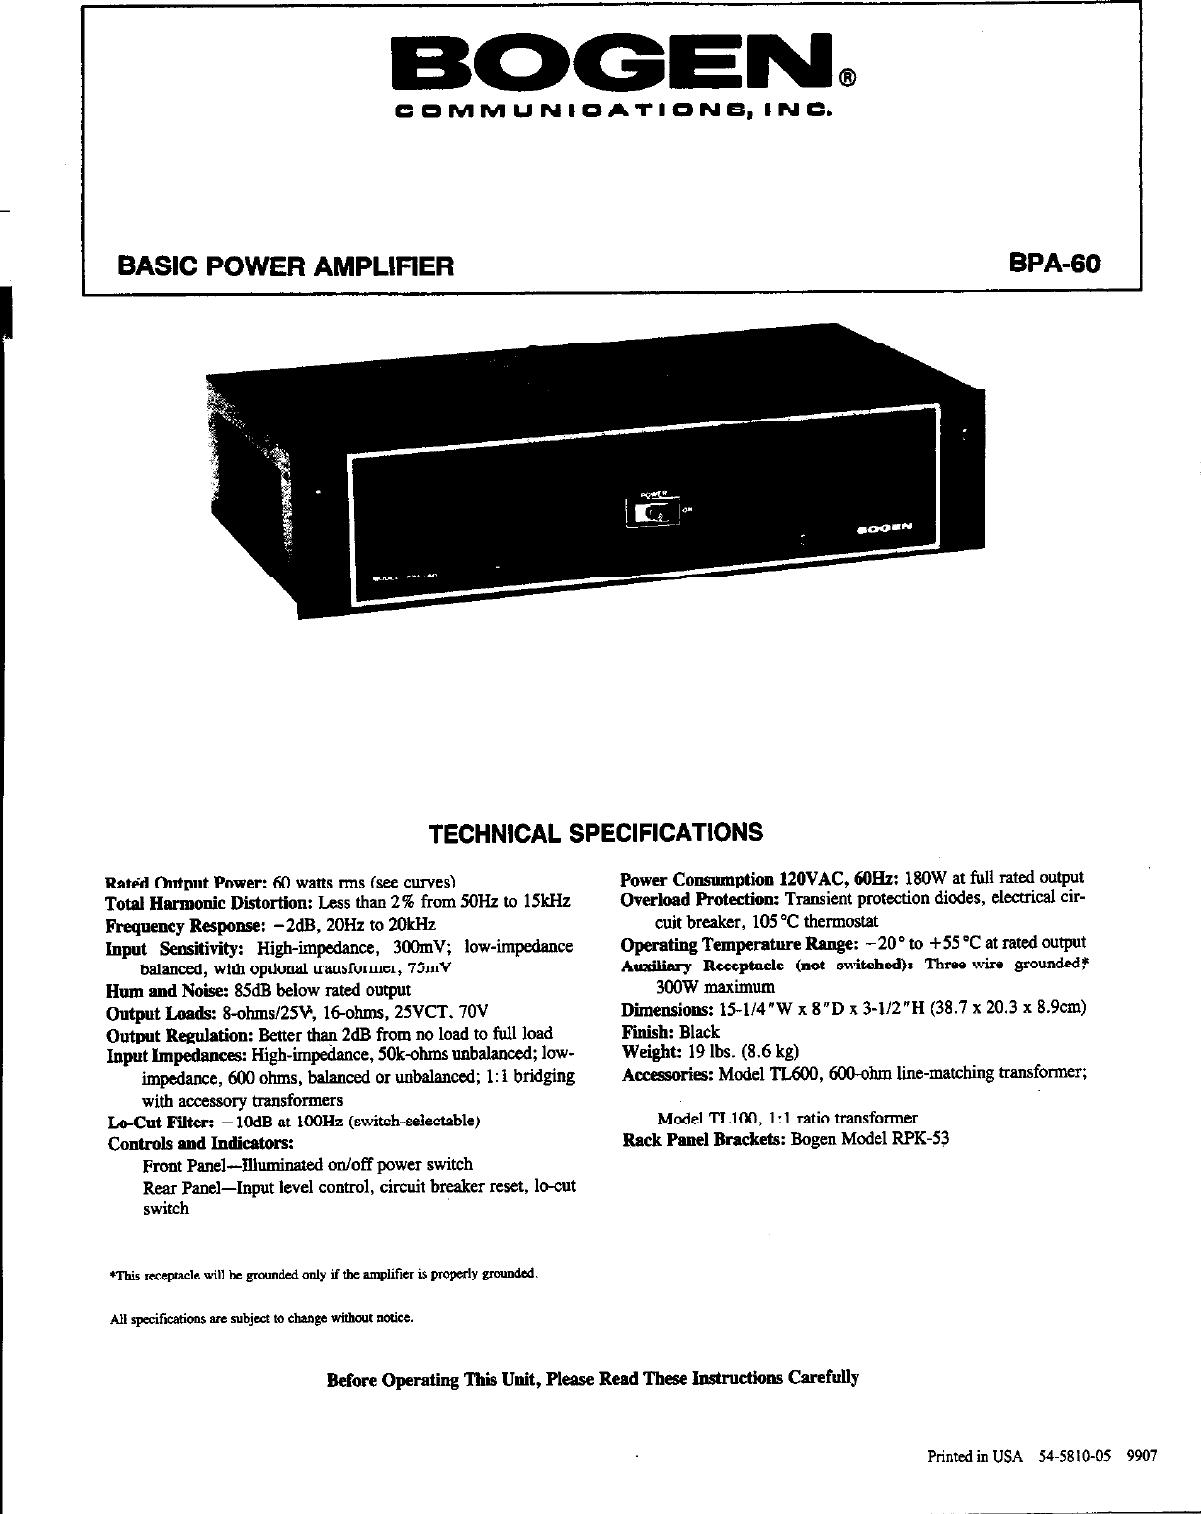 Bogen Communications Car Amplifier Bpa 60 Users Manual